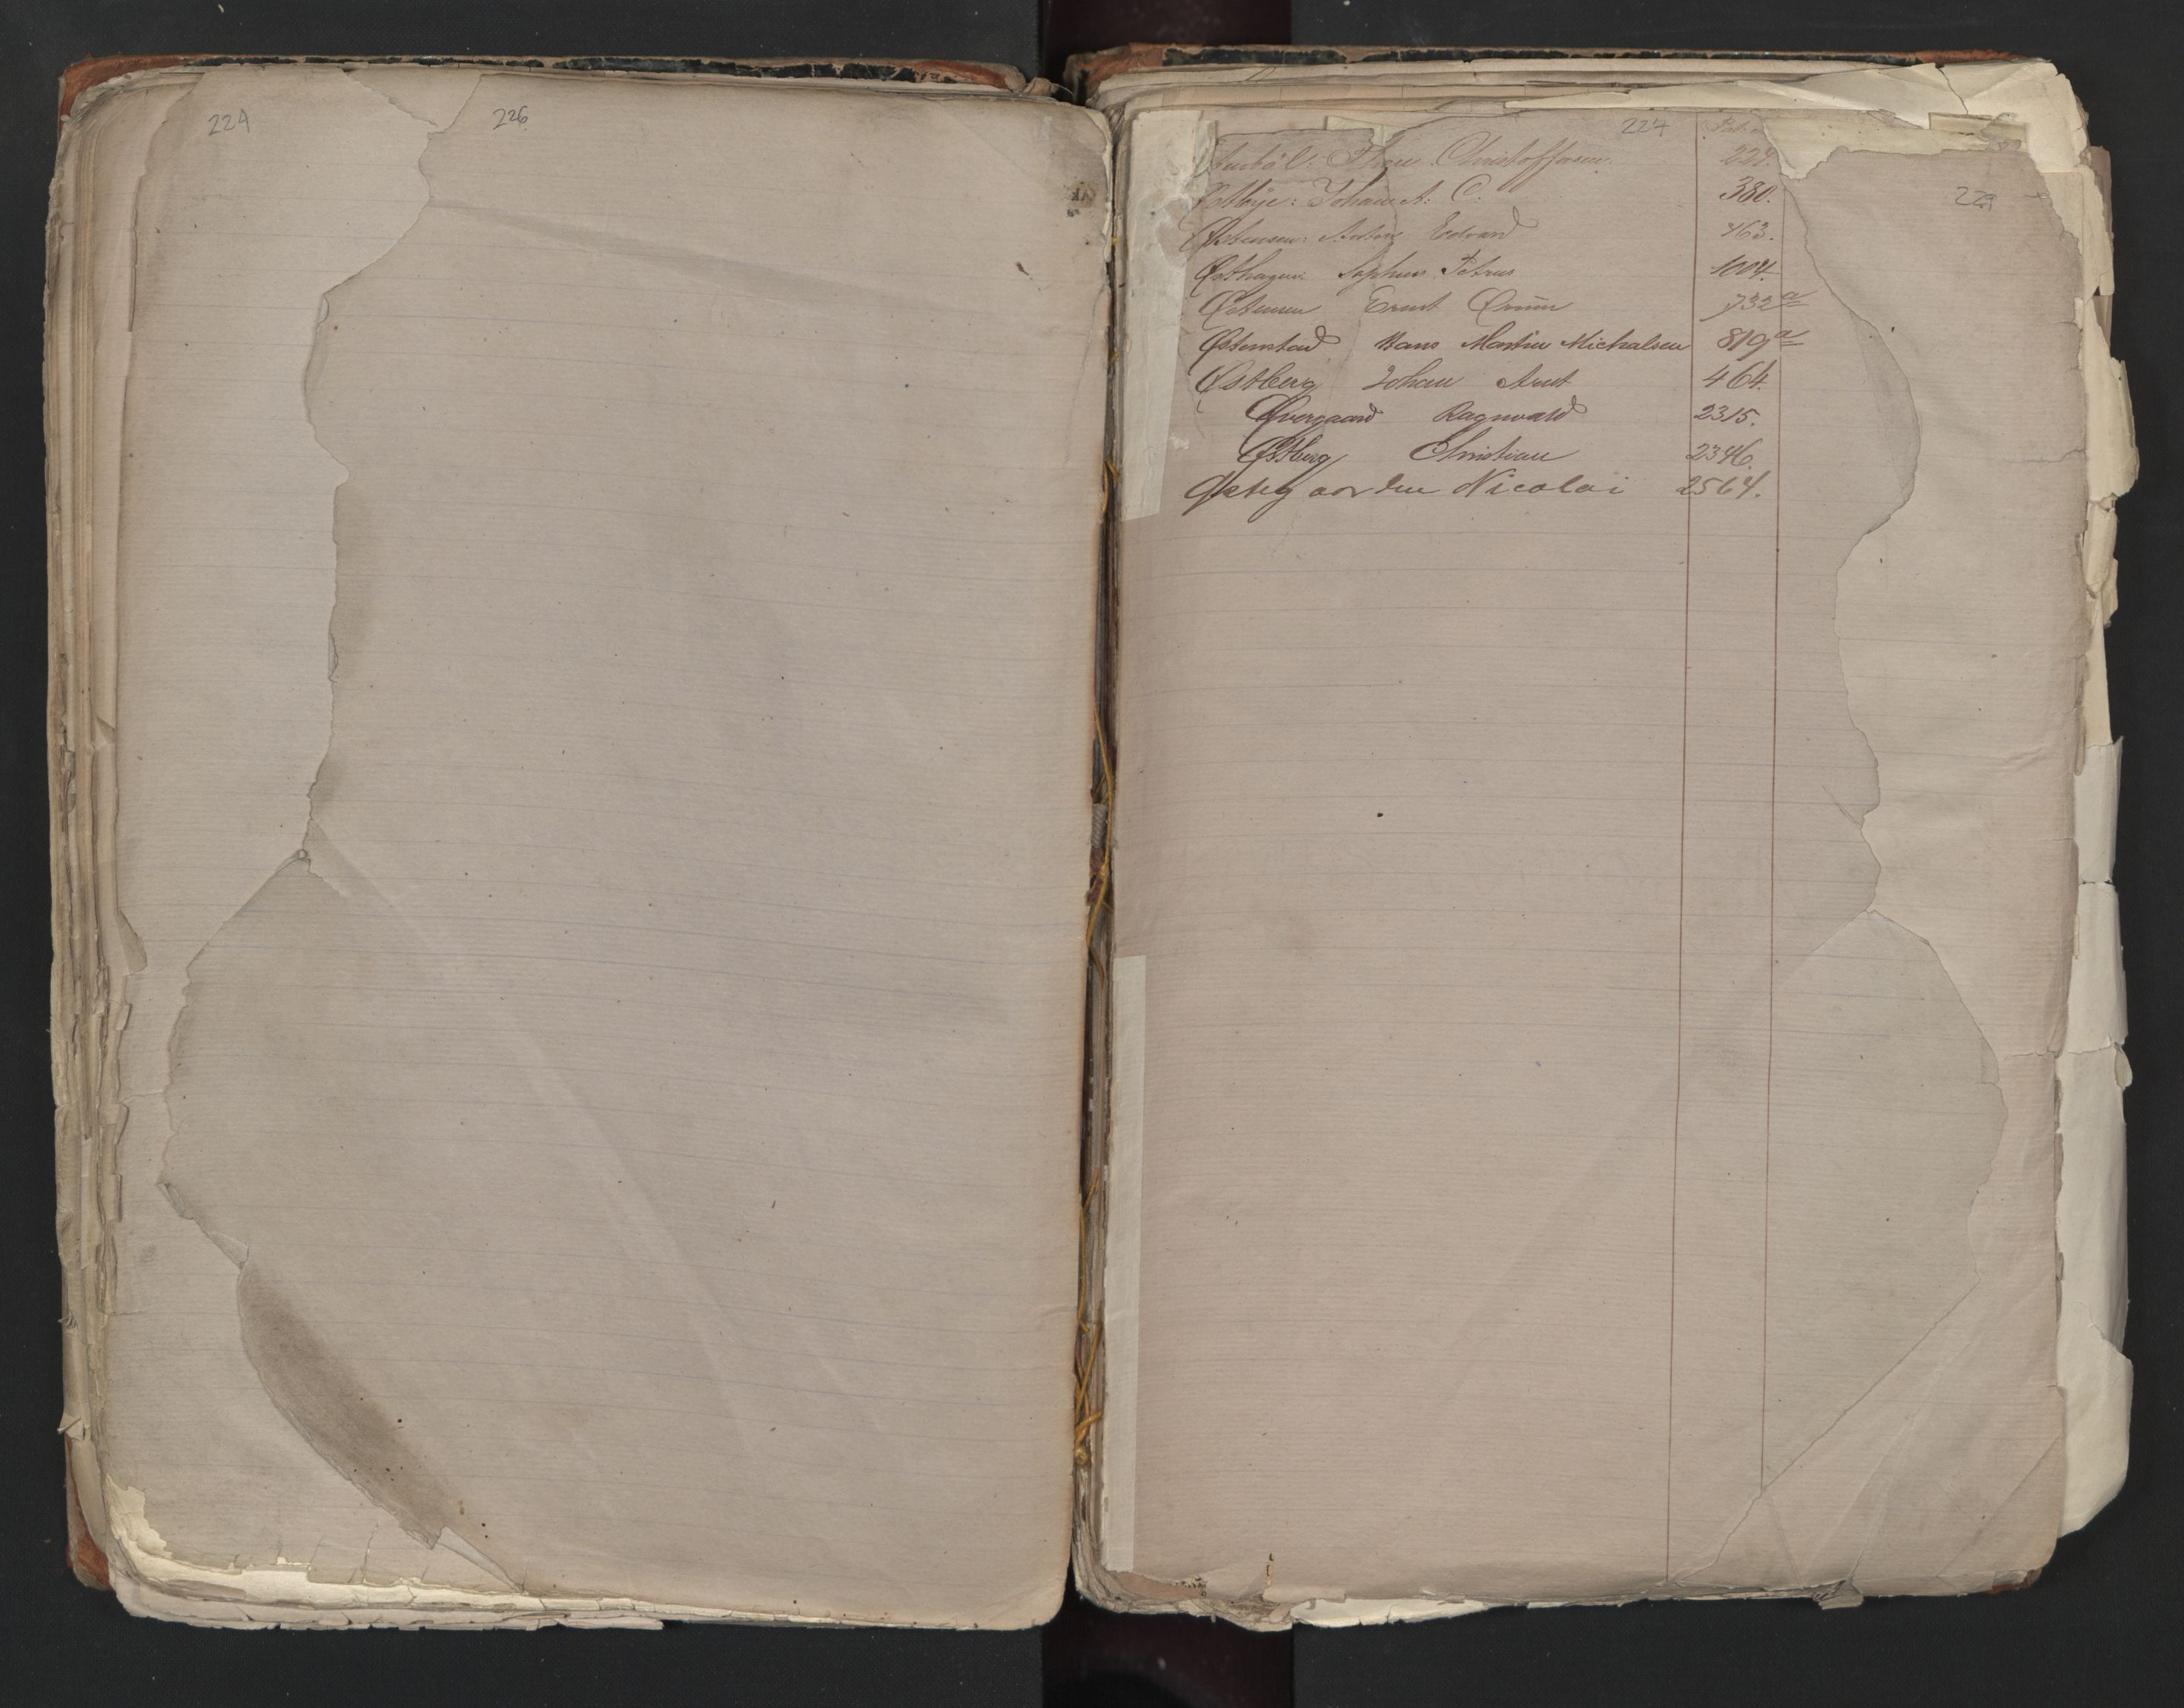 SAO, Oslo sjømannskontor, F/Fa/L0001: Register for Kristiania krets, 1866-1891, s. 226-227